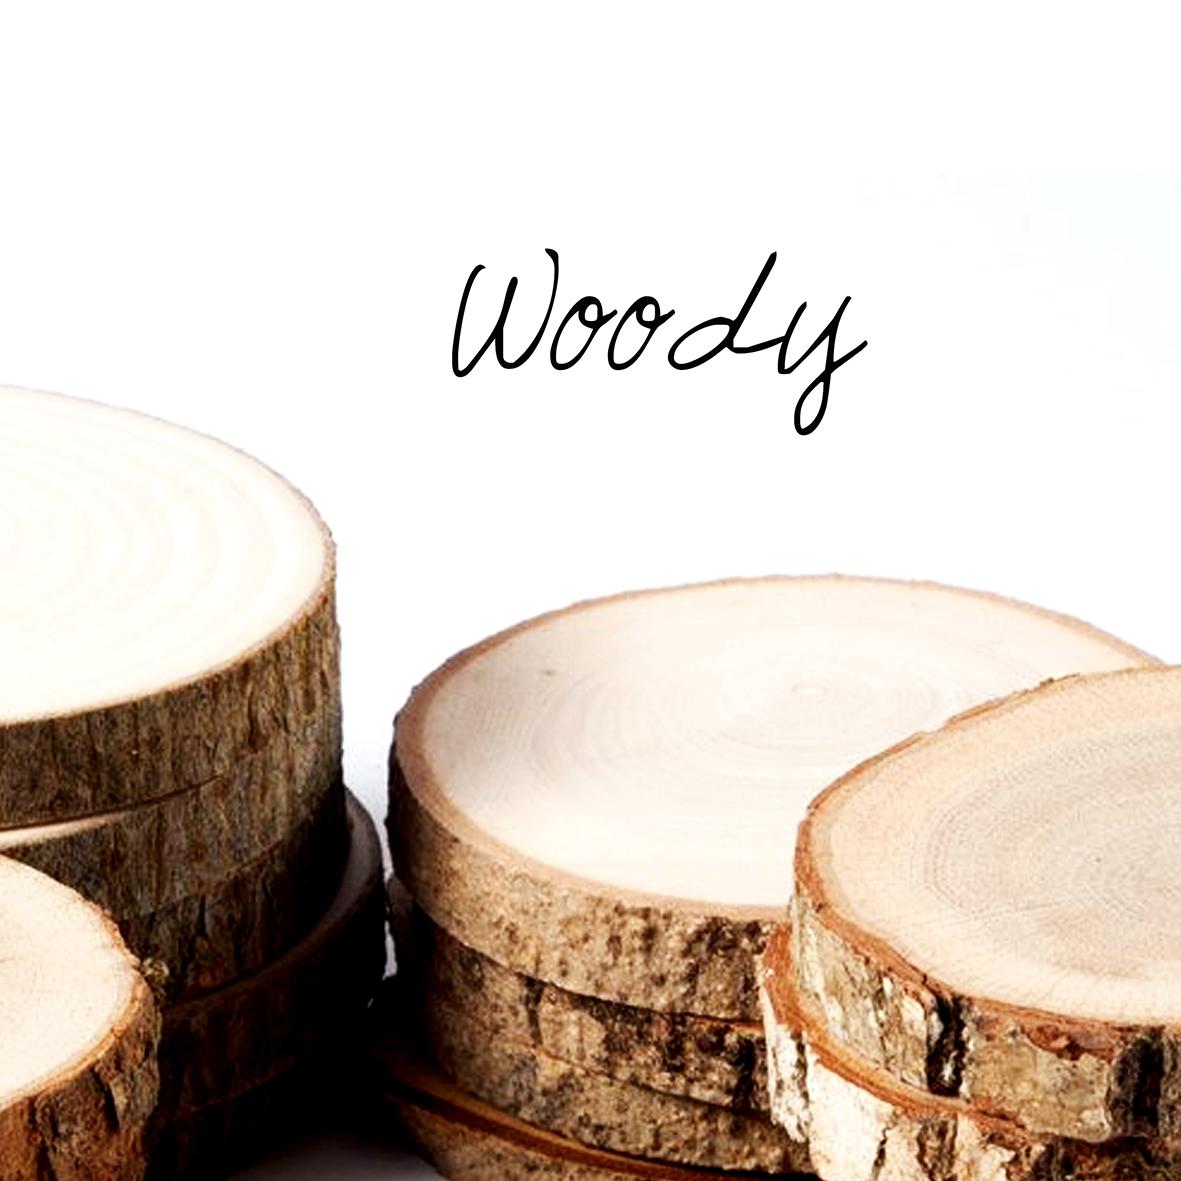 f-woody.jpg